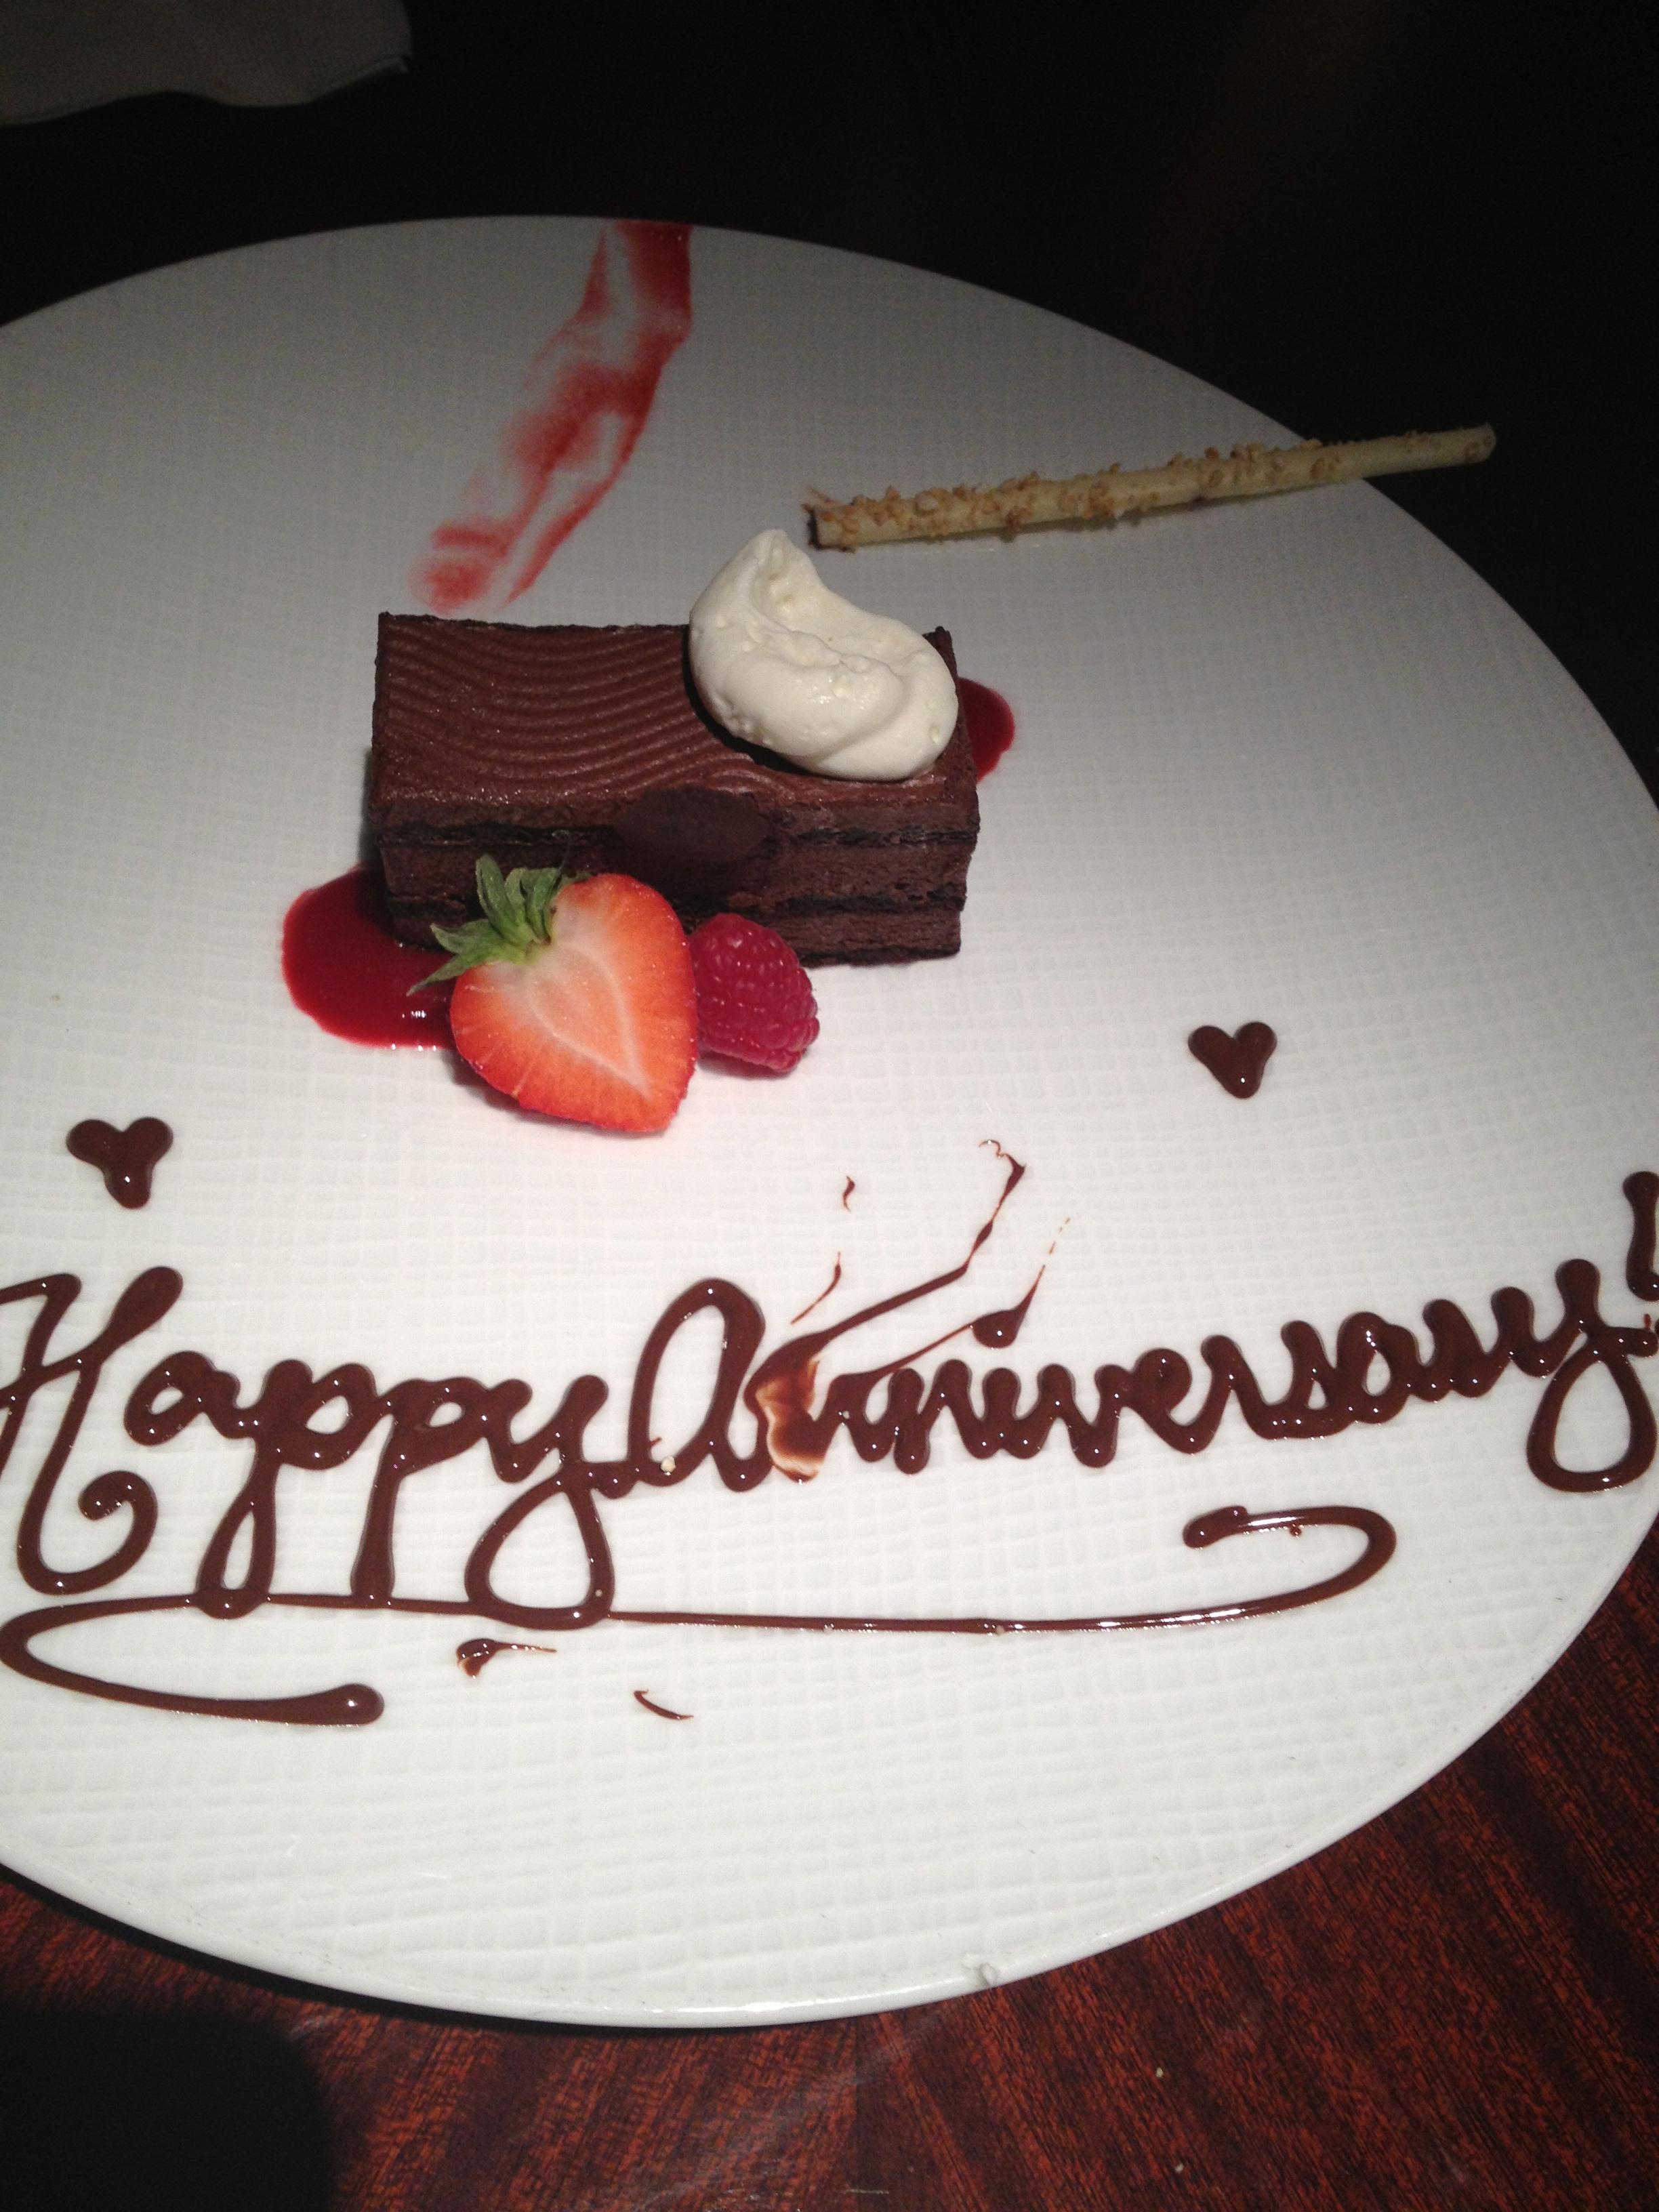 A beautiful Anniversary dessert!